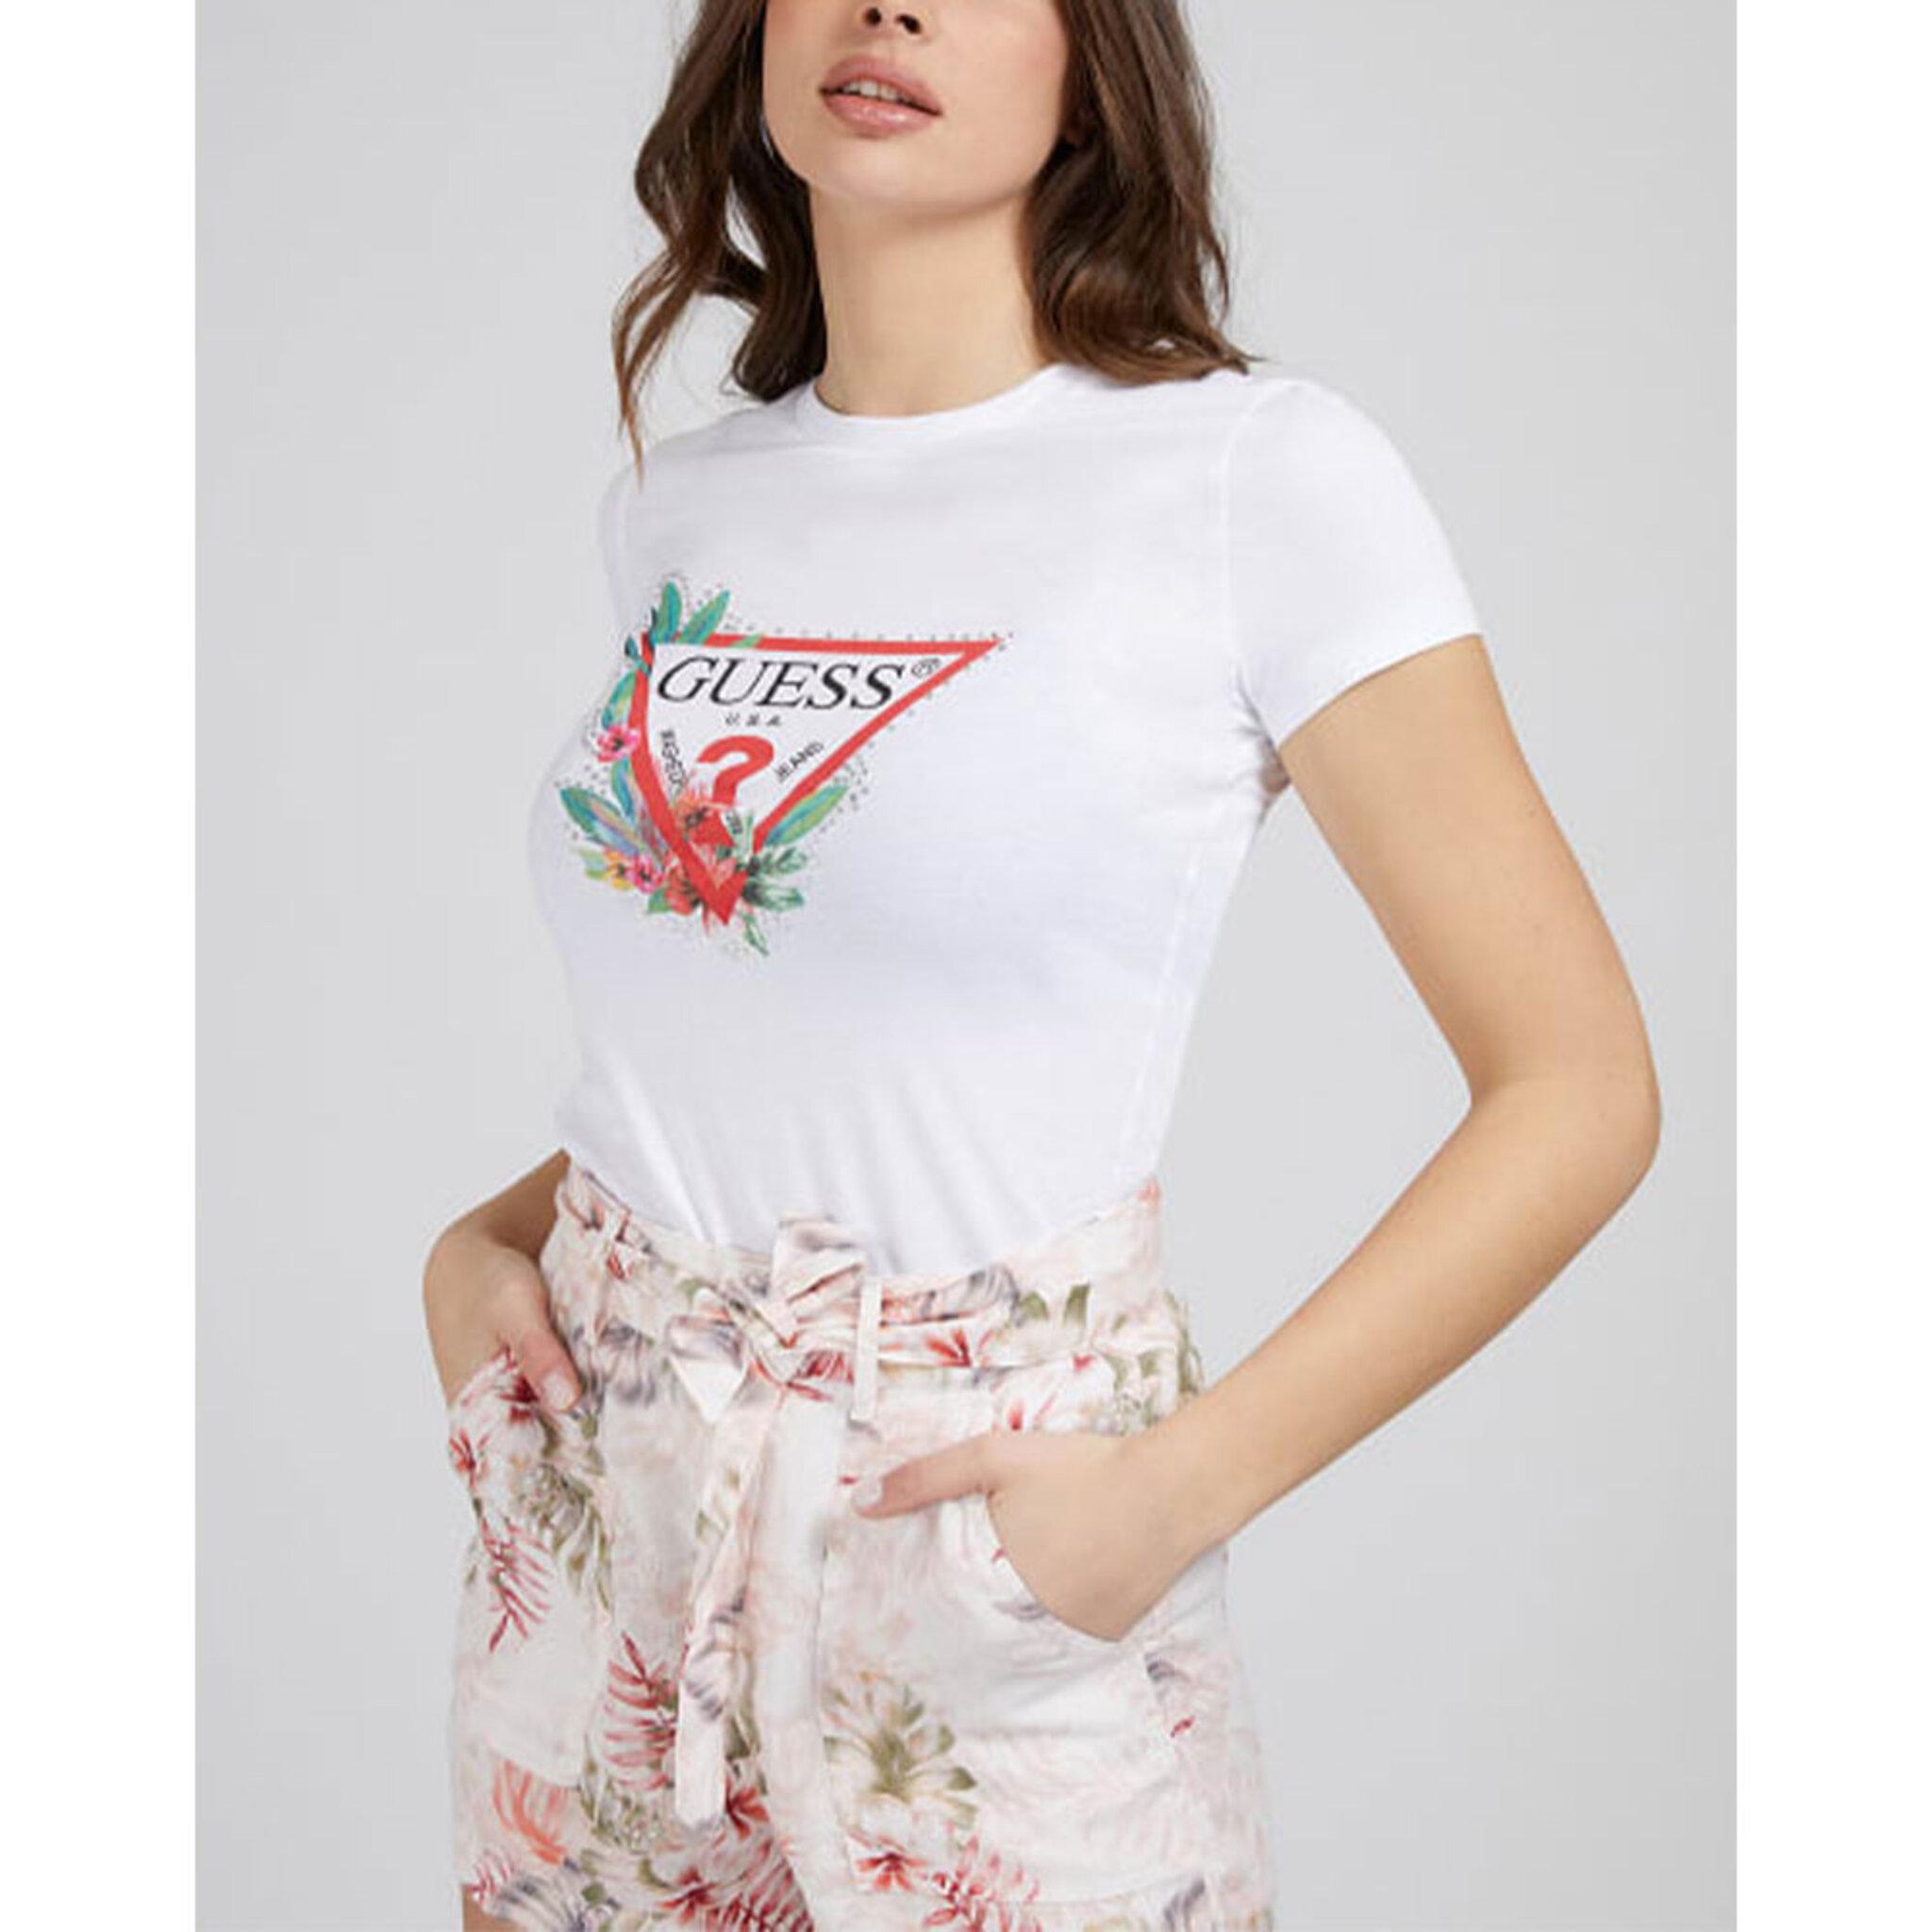 Ss Cn Nora Tshirt Short Sleeves